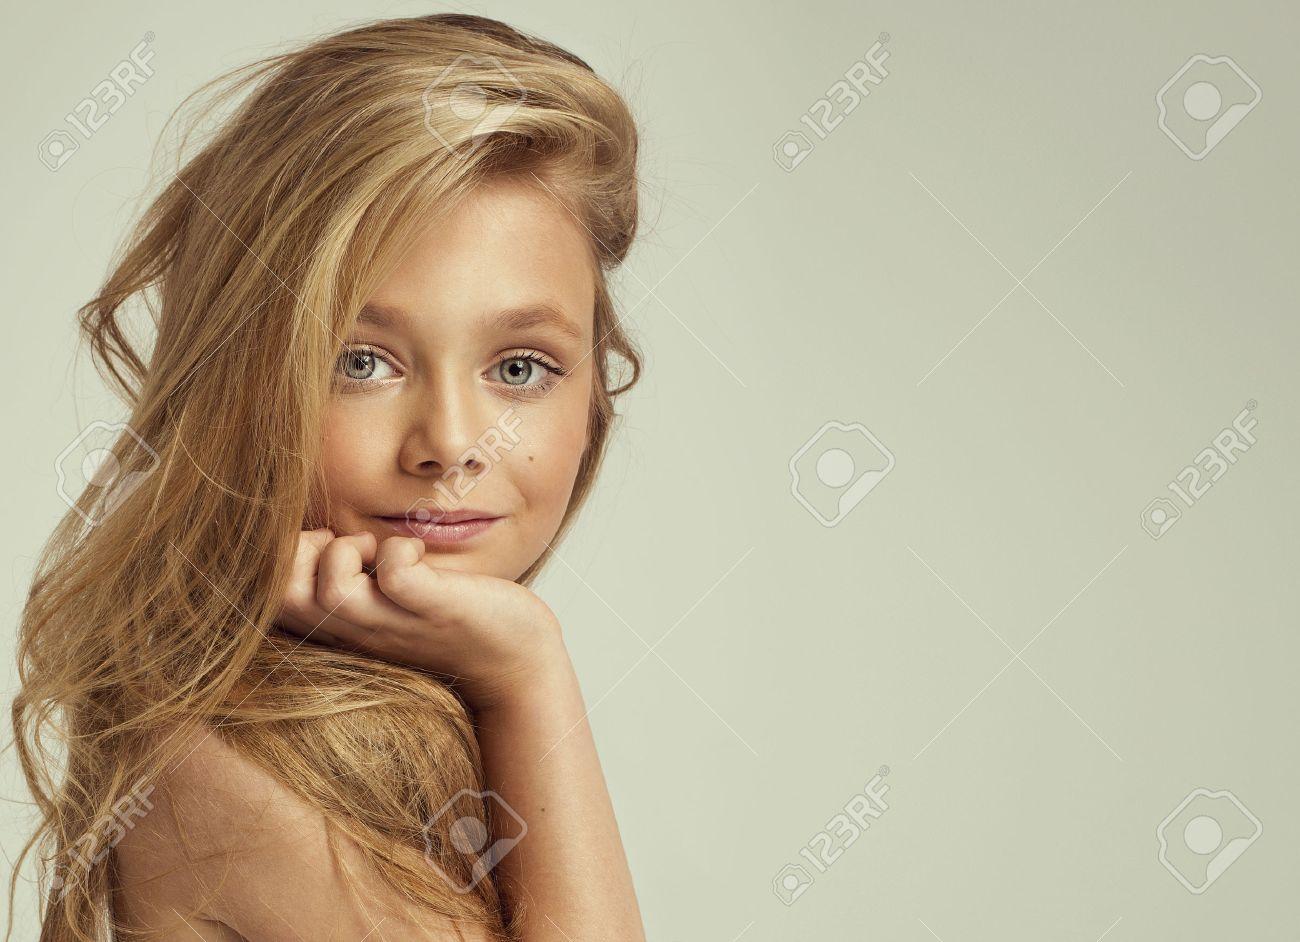 90c472297d3 Portrait of smiling little girl Stock Photo - 43540751